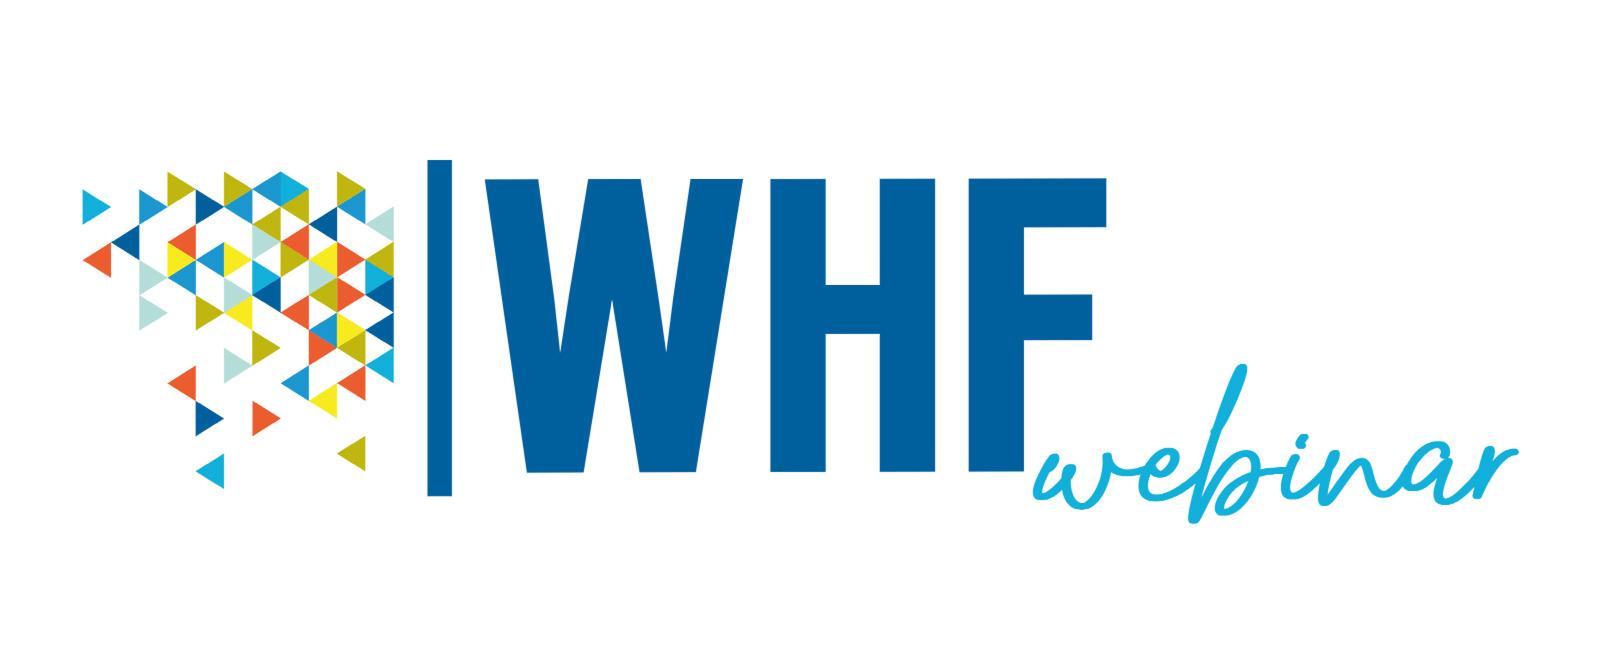 logo  webinar whf png